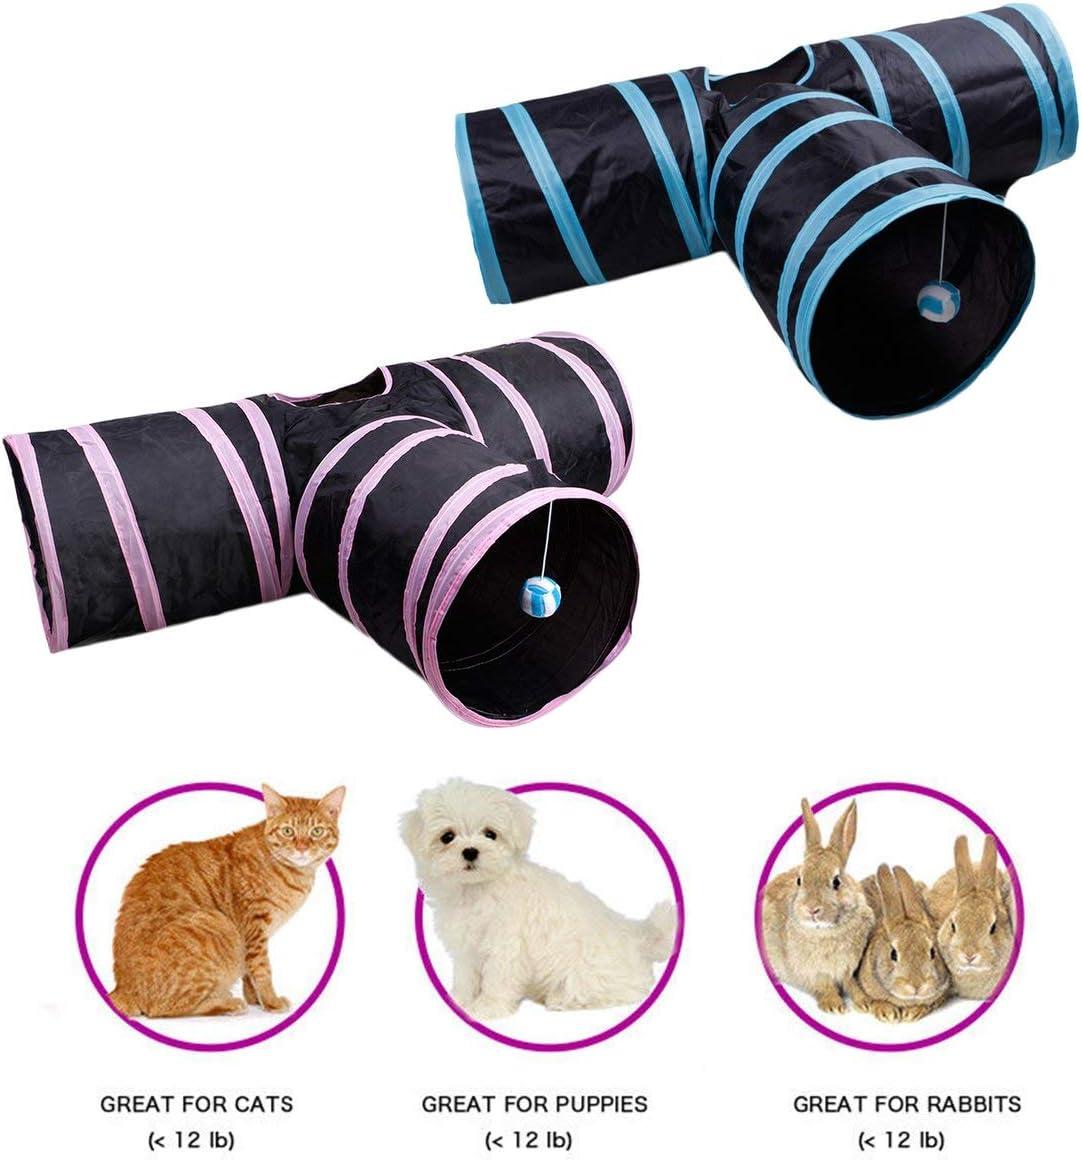 Sairis Pet Supplies Cat Tunnel 3 Way Kitten Rabbit Play Tube Toy Paper Tunnel Foldable Cat Tunnel Cat Toy Drill Bucket